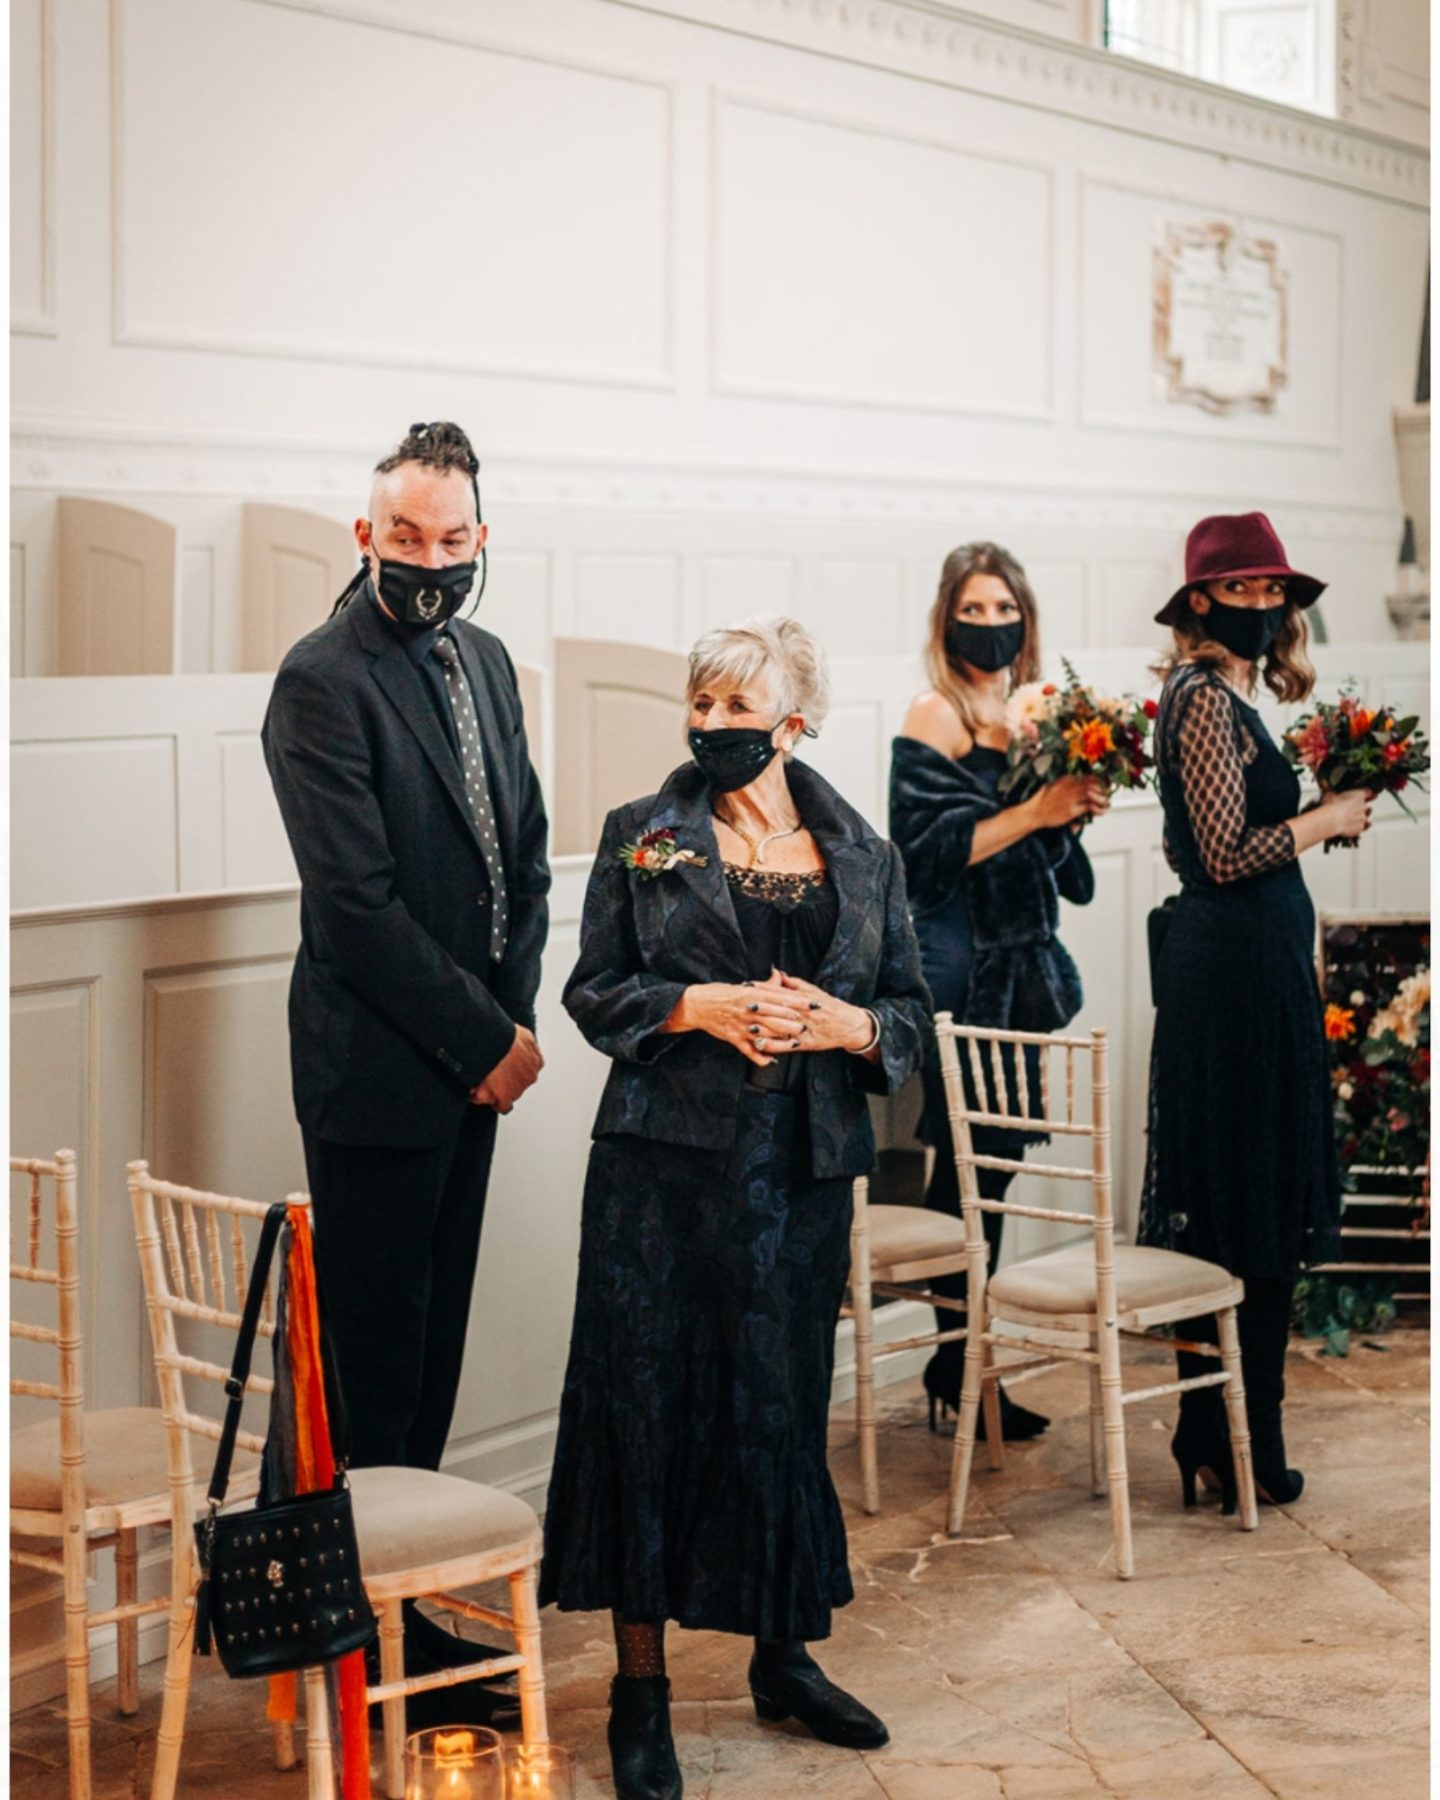 covid wedding ceremony in church